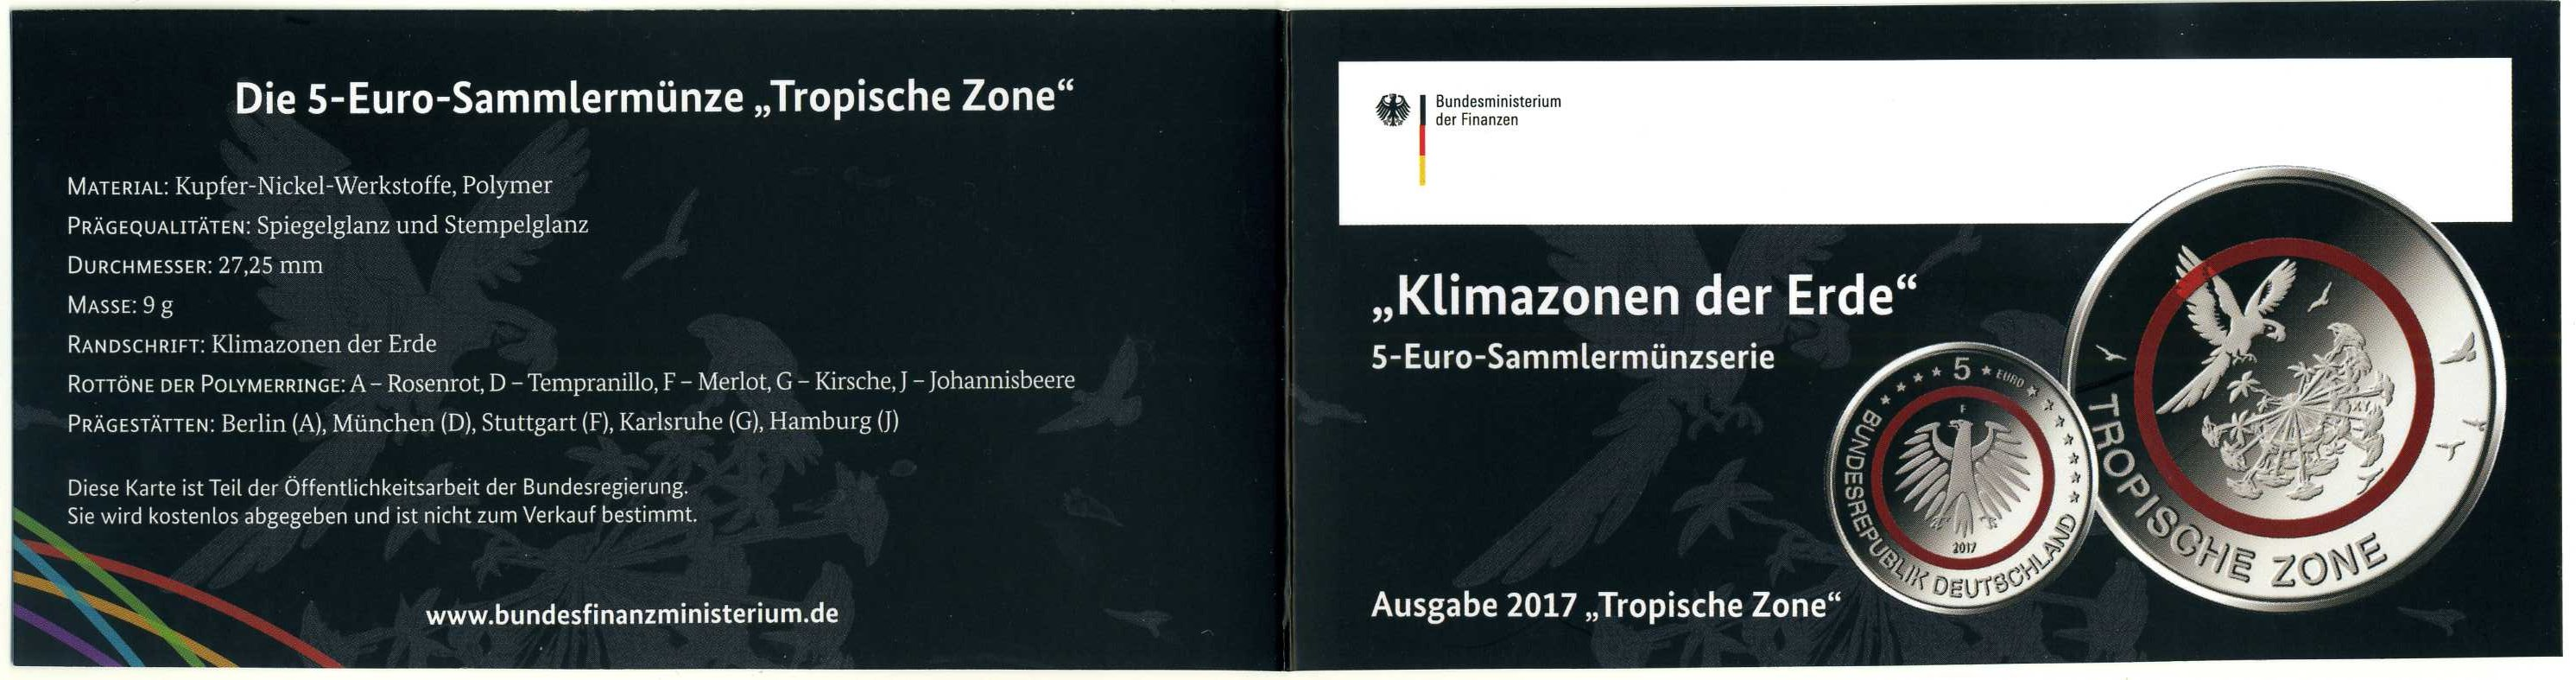 2017 Flyer Tropische Zone 1.jpg